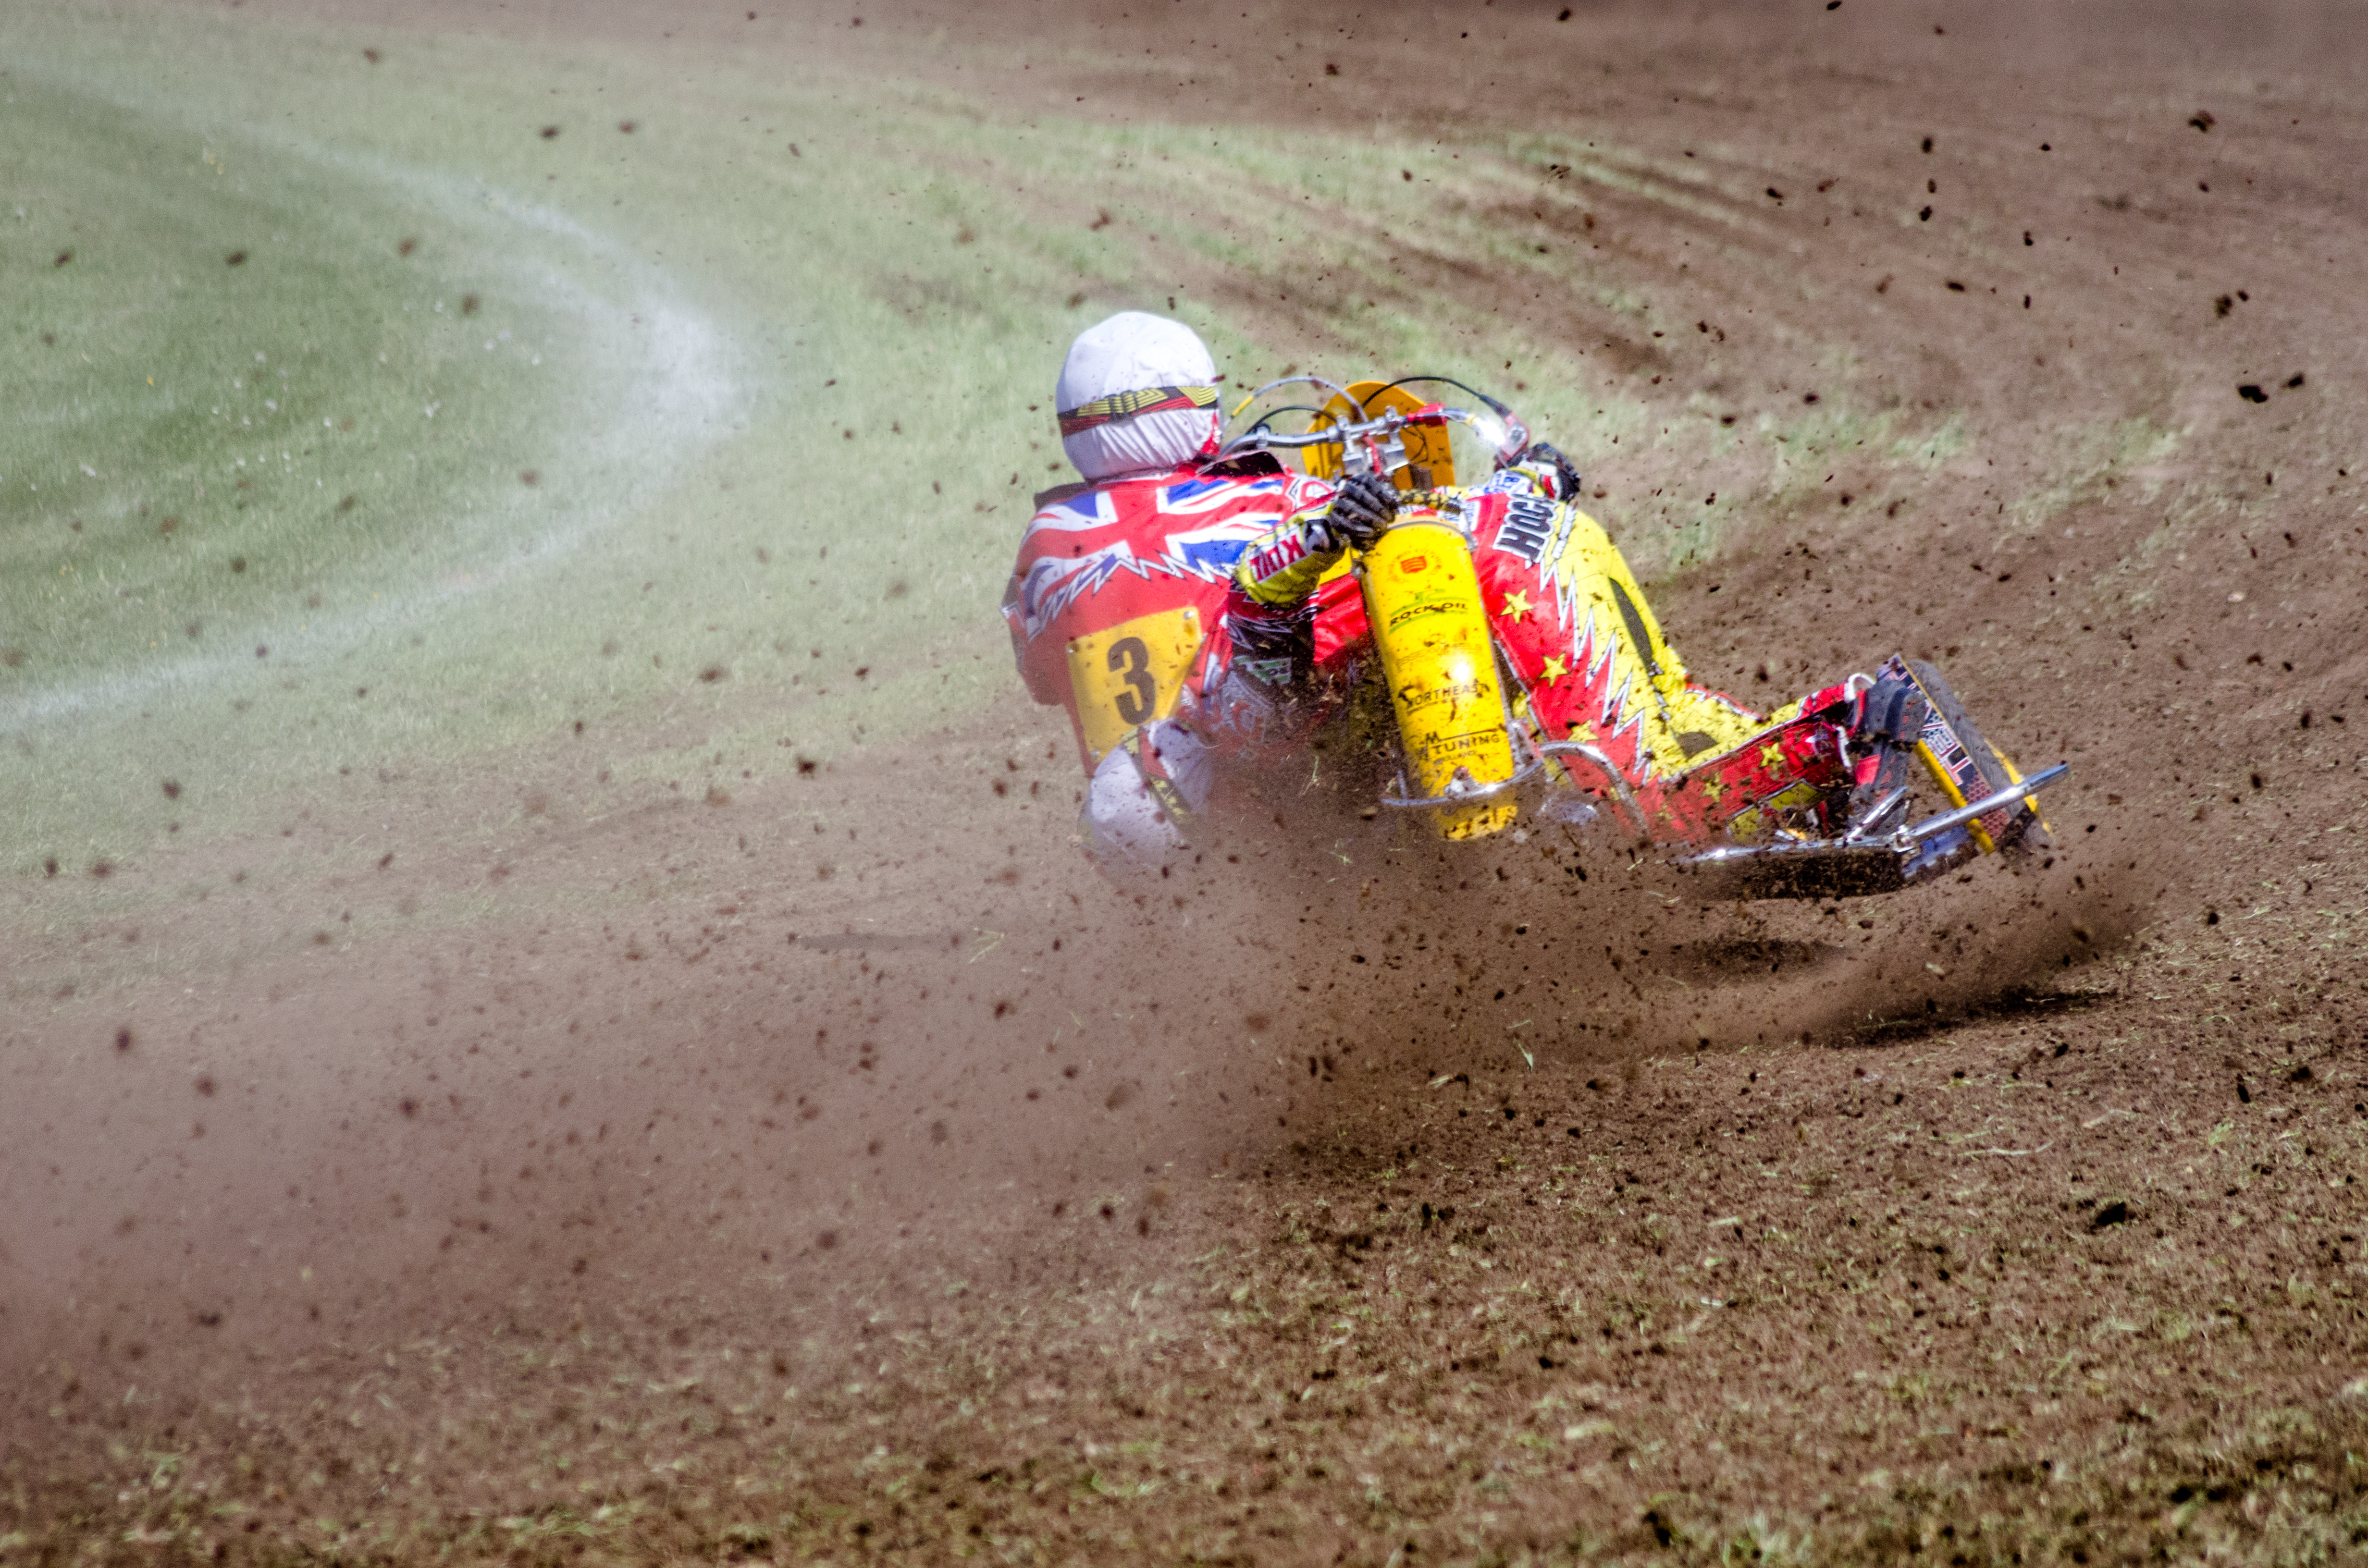 спорт мотоцикл гонка sports motorcycle race  № 3296373 без смс